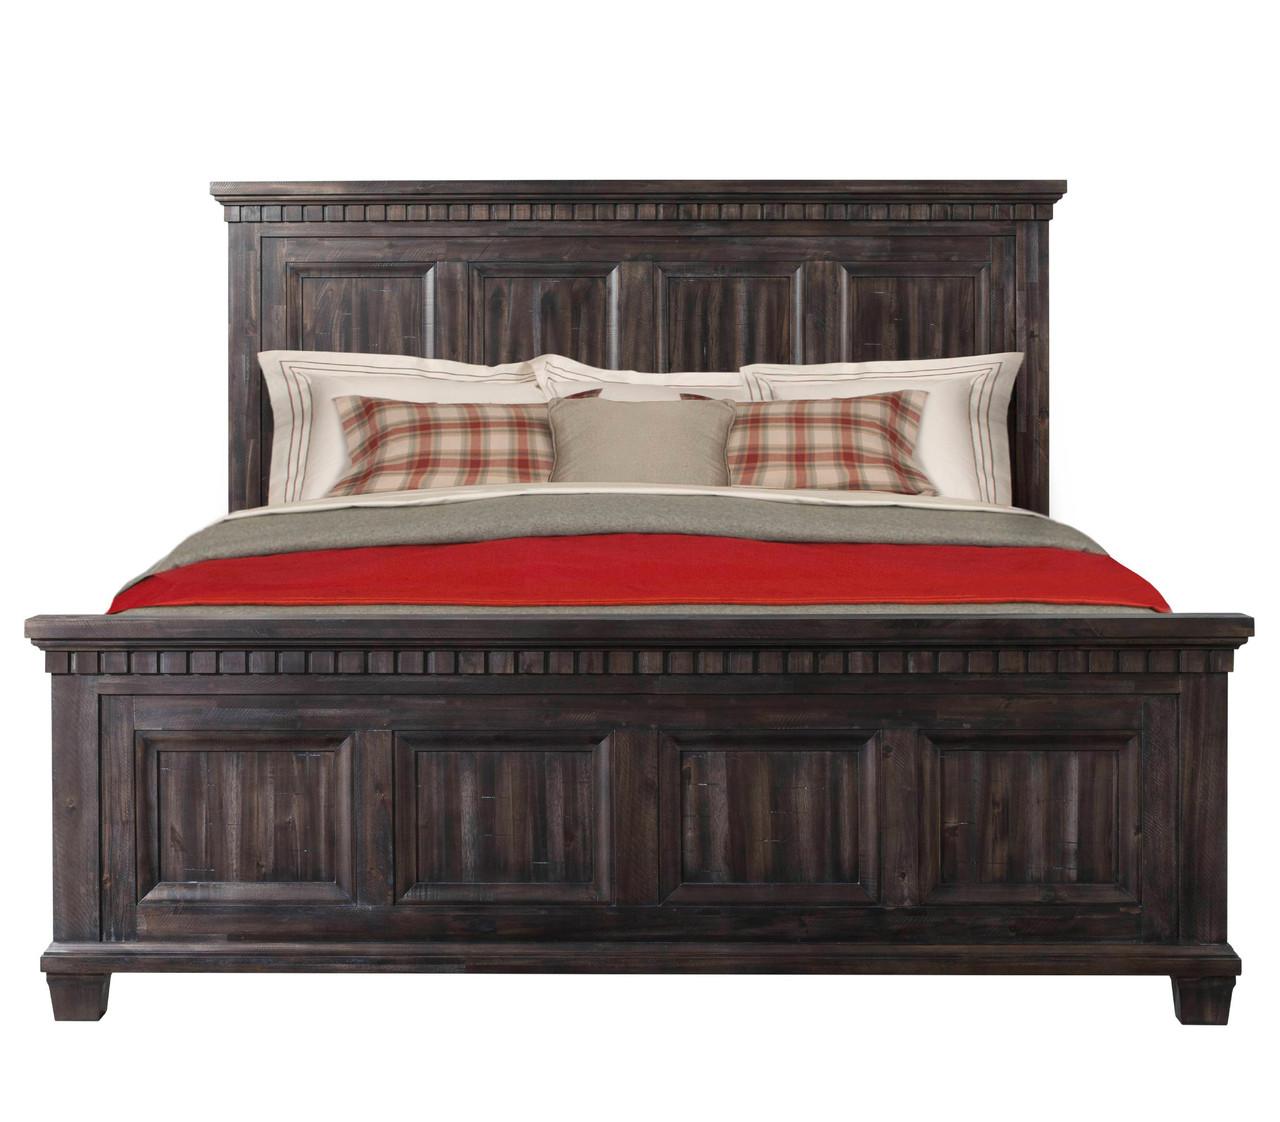 Santa Fe Weathered Black Oak finish 6pc Bedroom Set